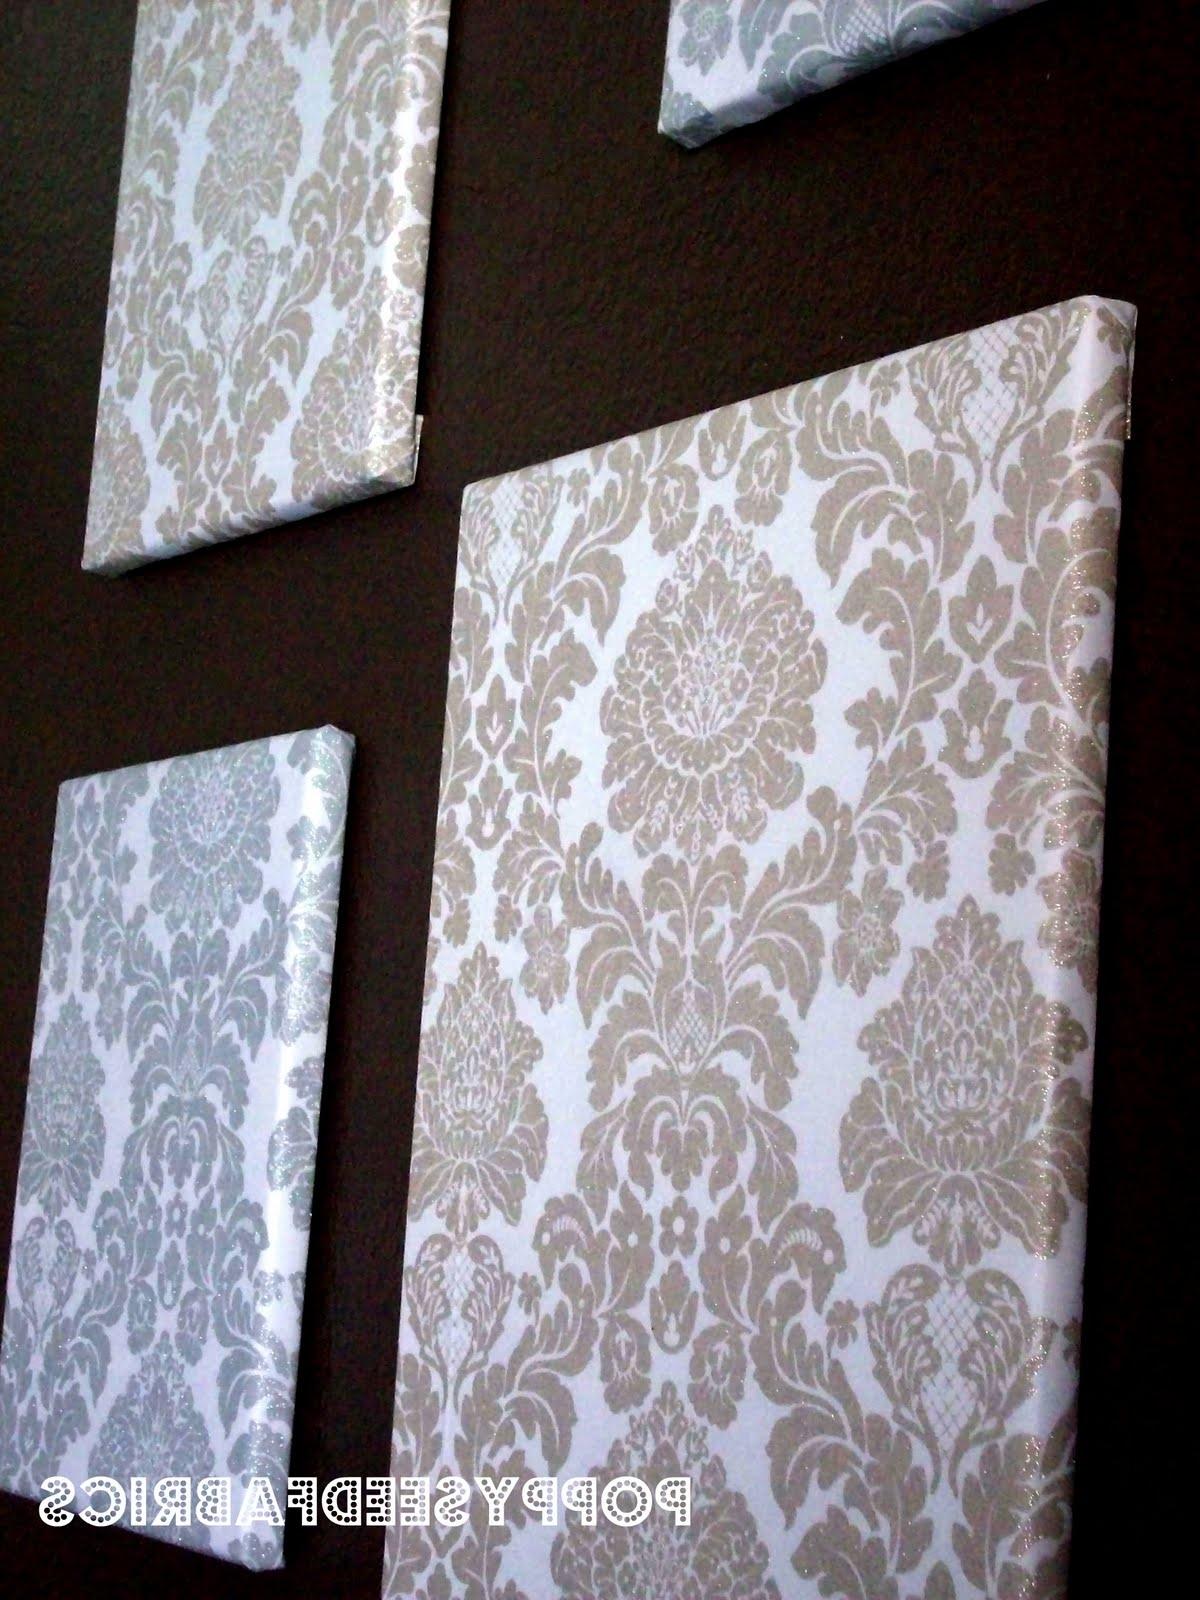 Cheap Fabric Wall Art Pertaining To Most Recent Poppyseed Fabrics: Fabric Wall Art Tutorial (View 2 of 15)